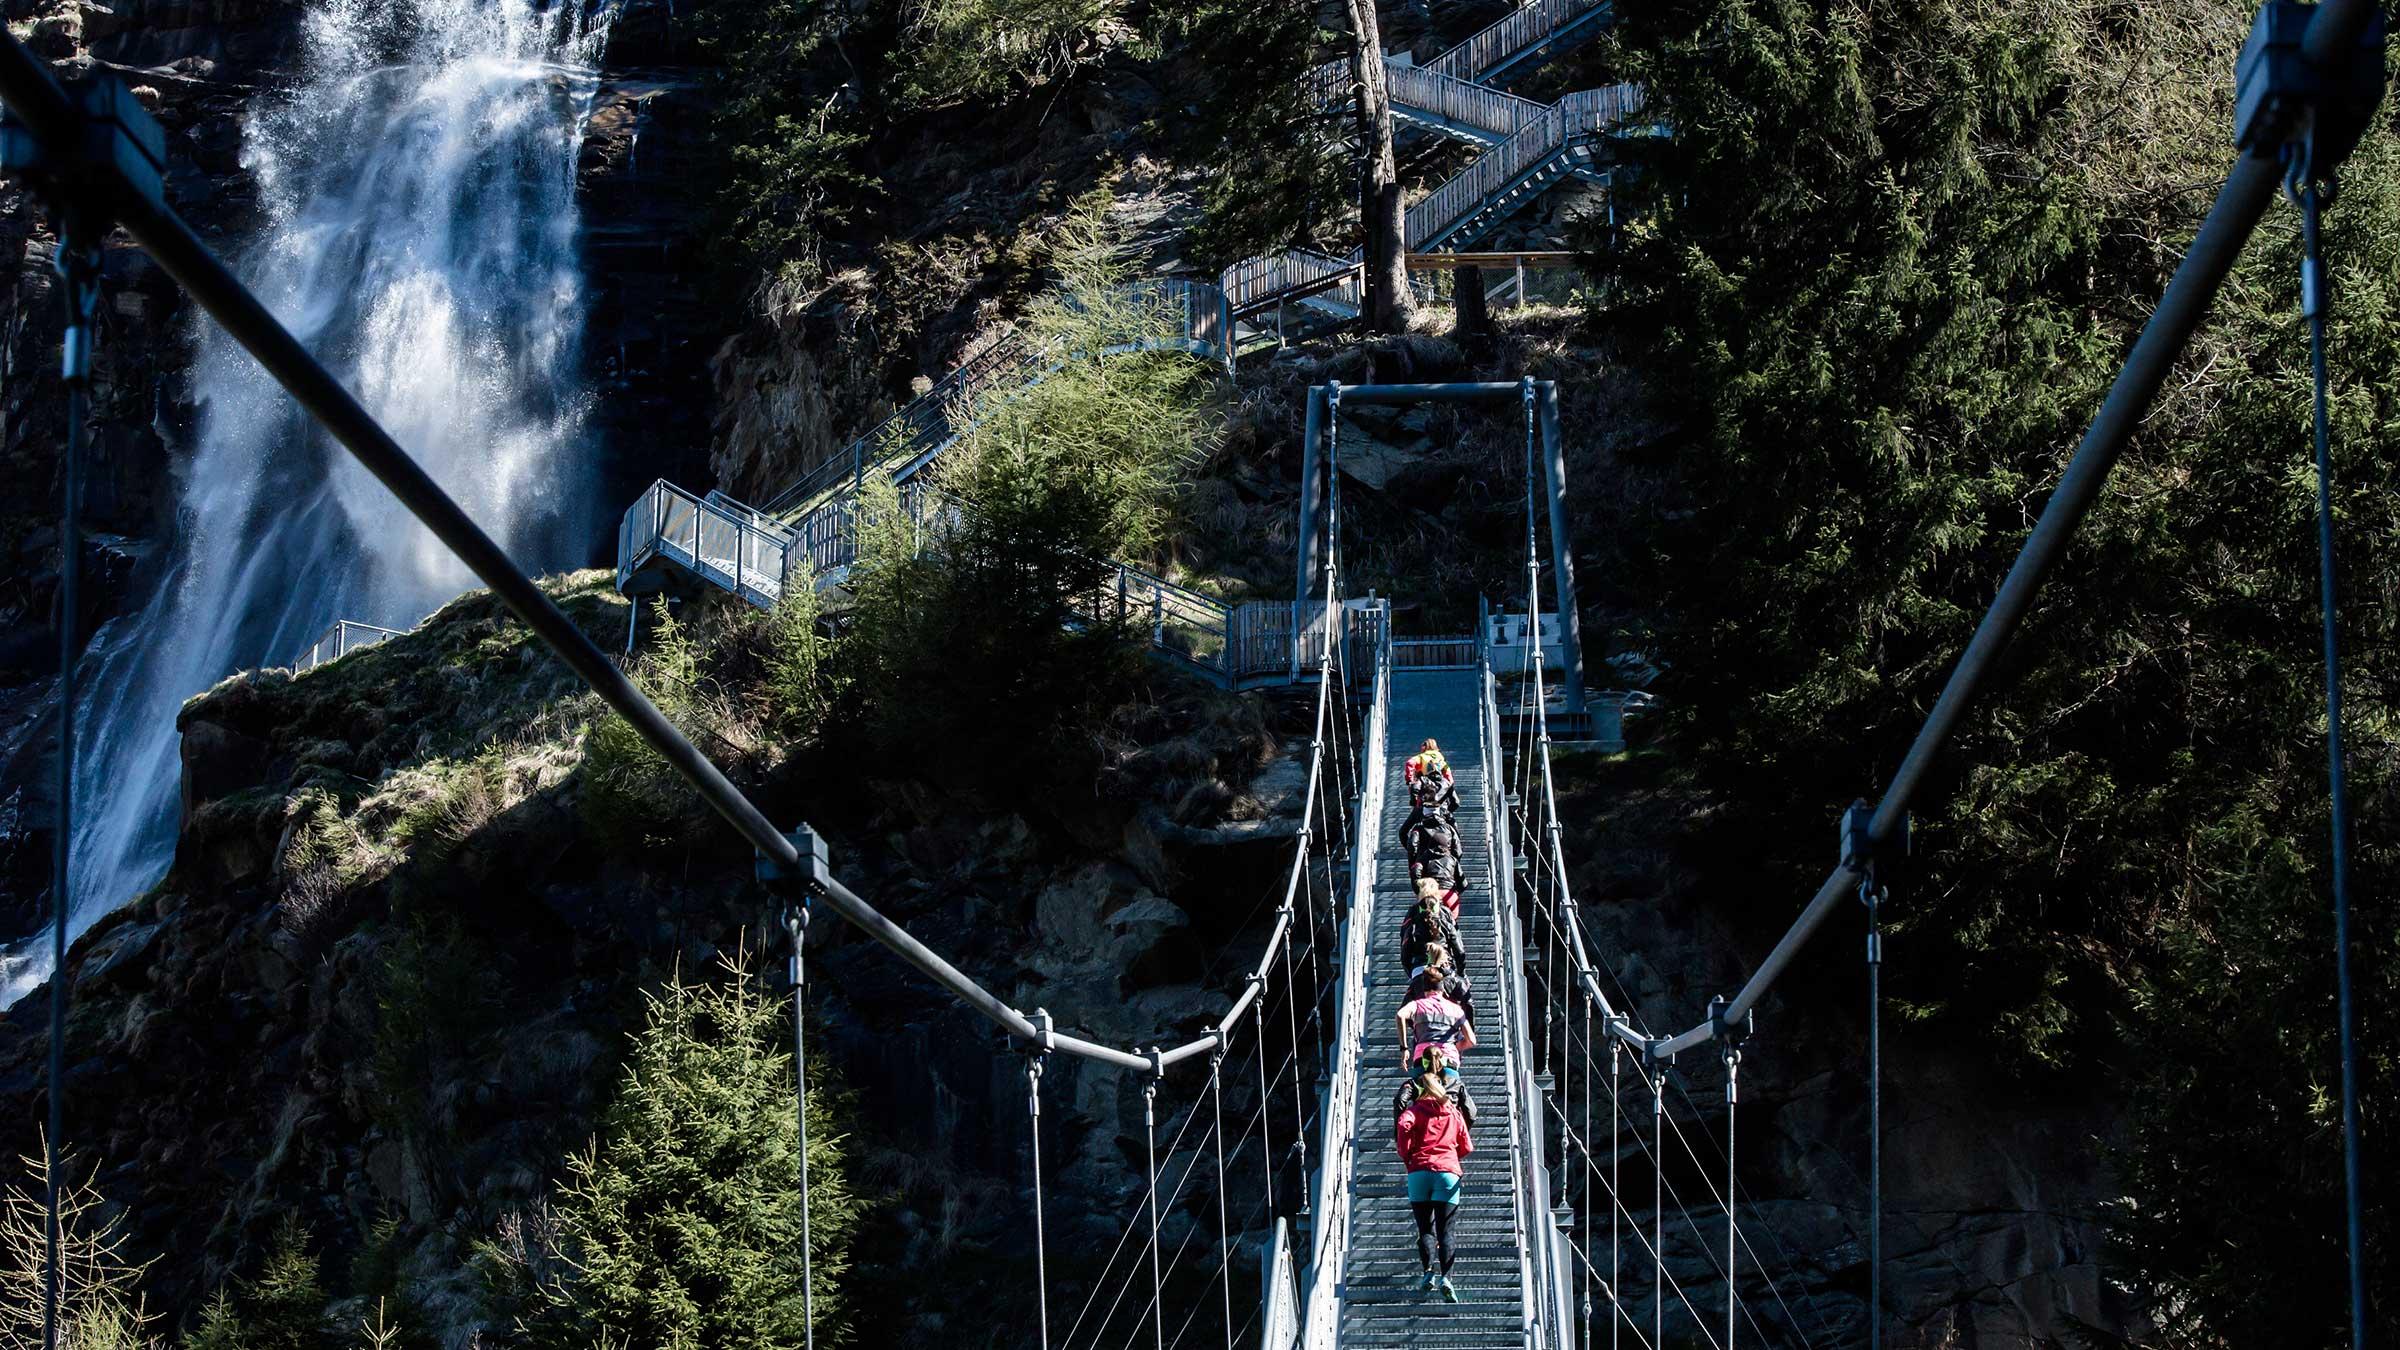 Trailrunning an der Hängebrücke am Stuibenfall - Trailrunning